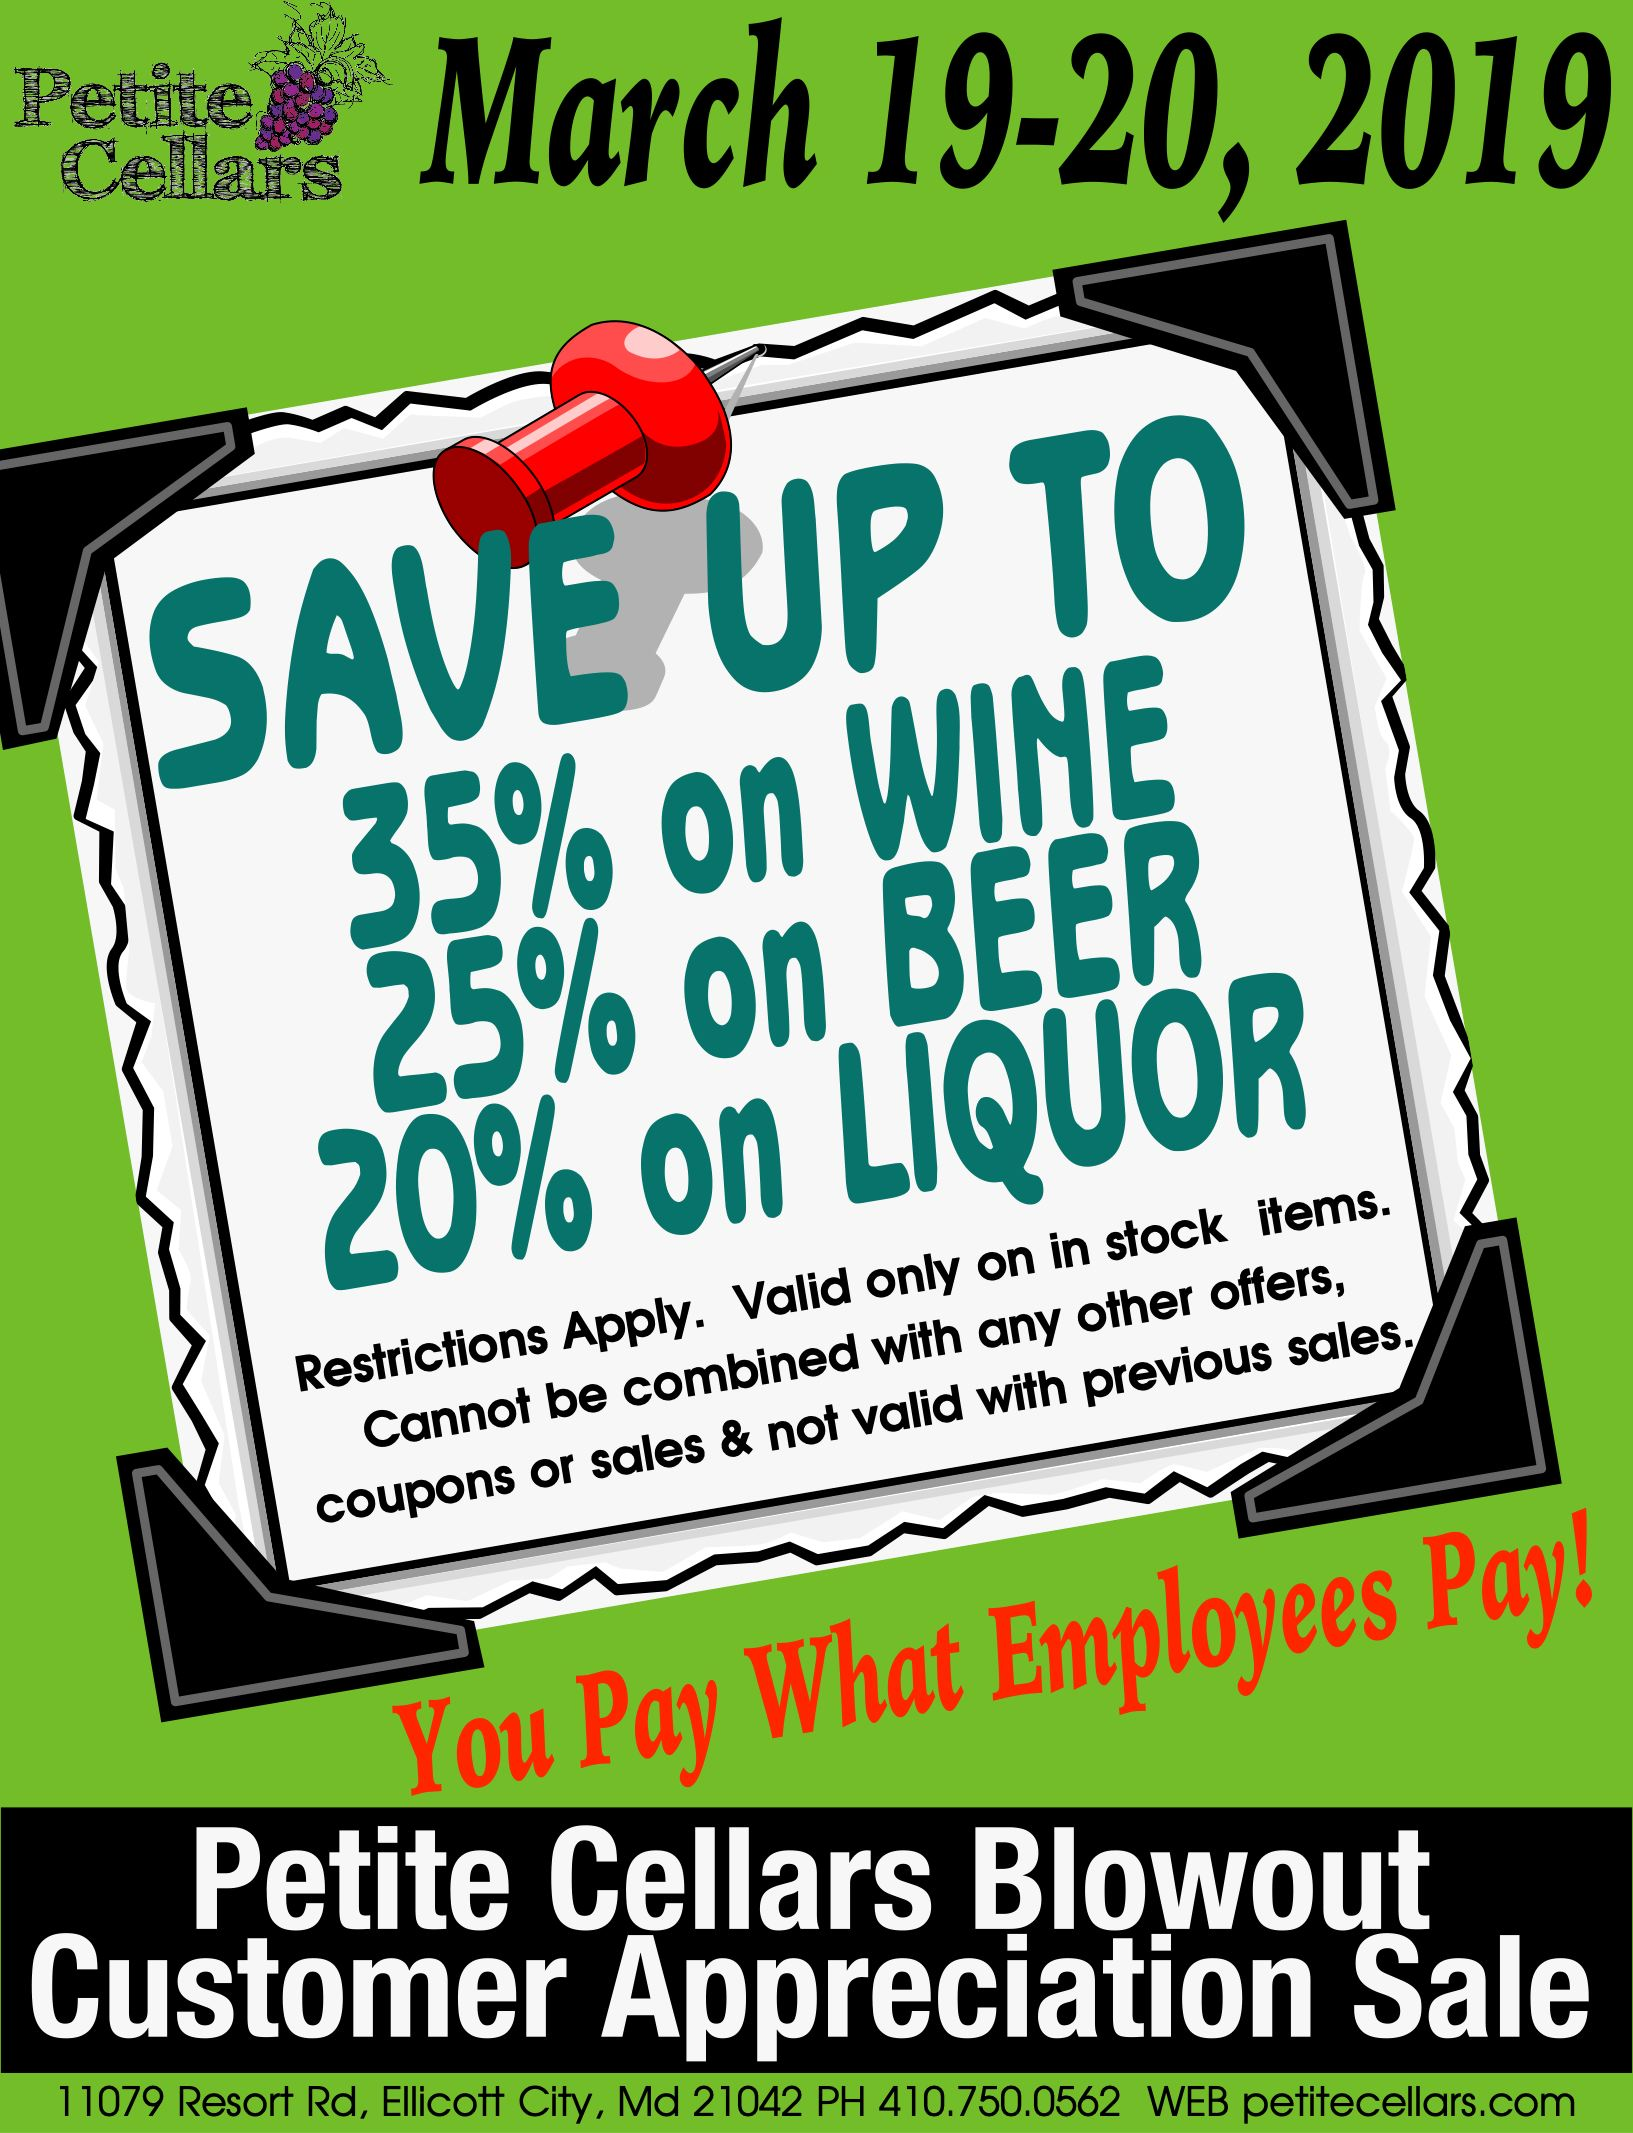 Petite Cust Appreciation Blowout Sale March '19.jpeg